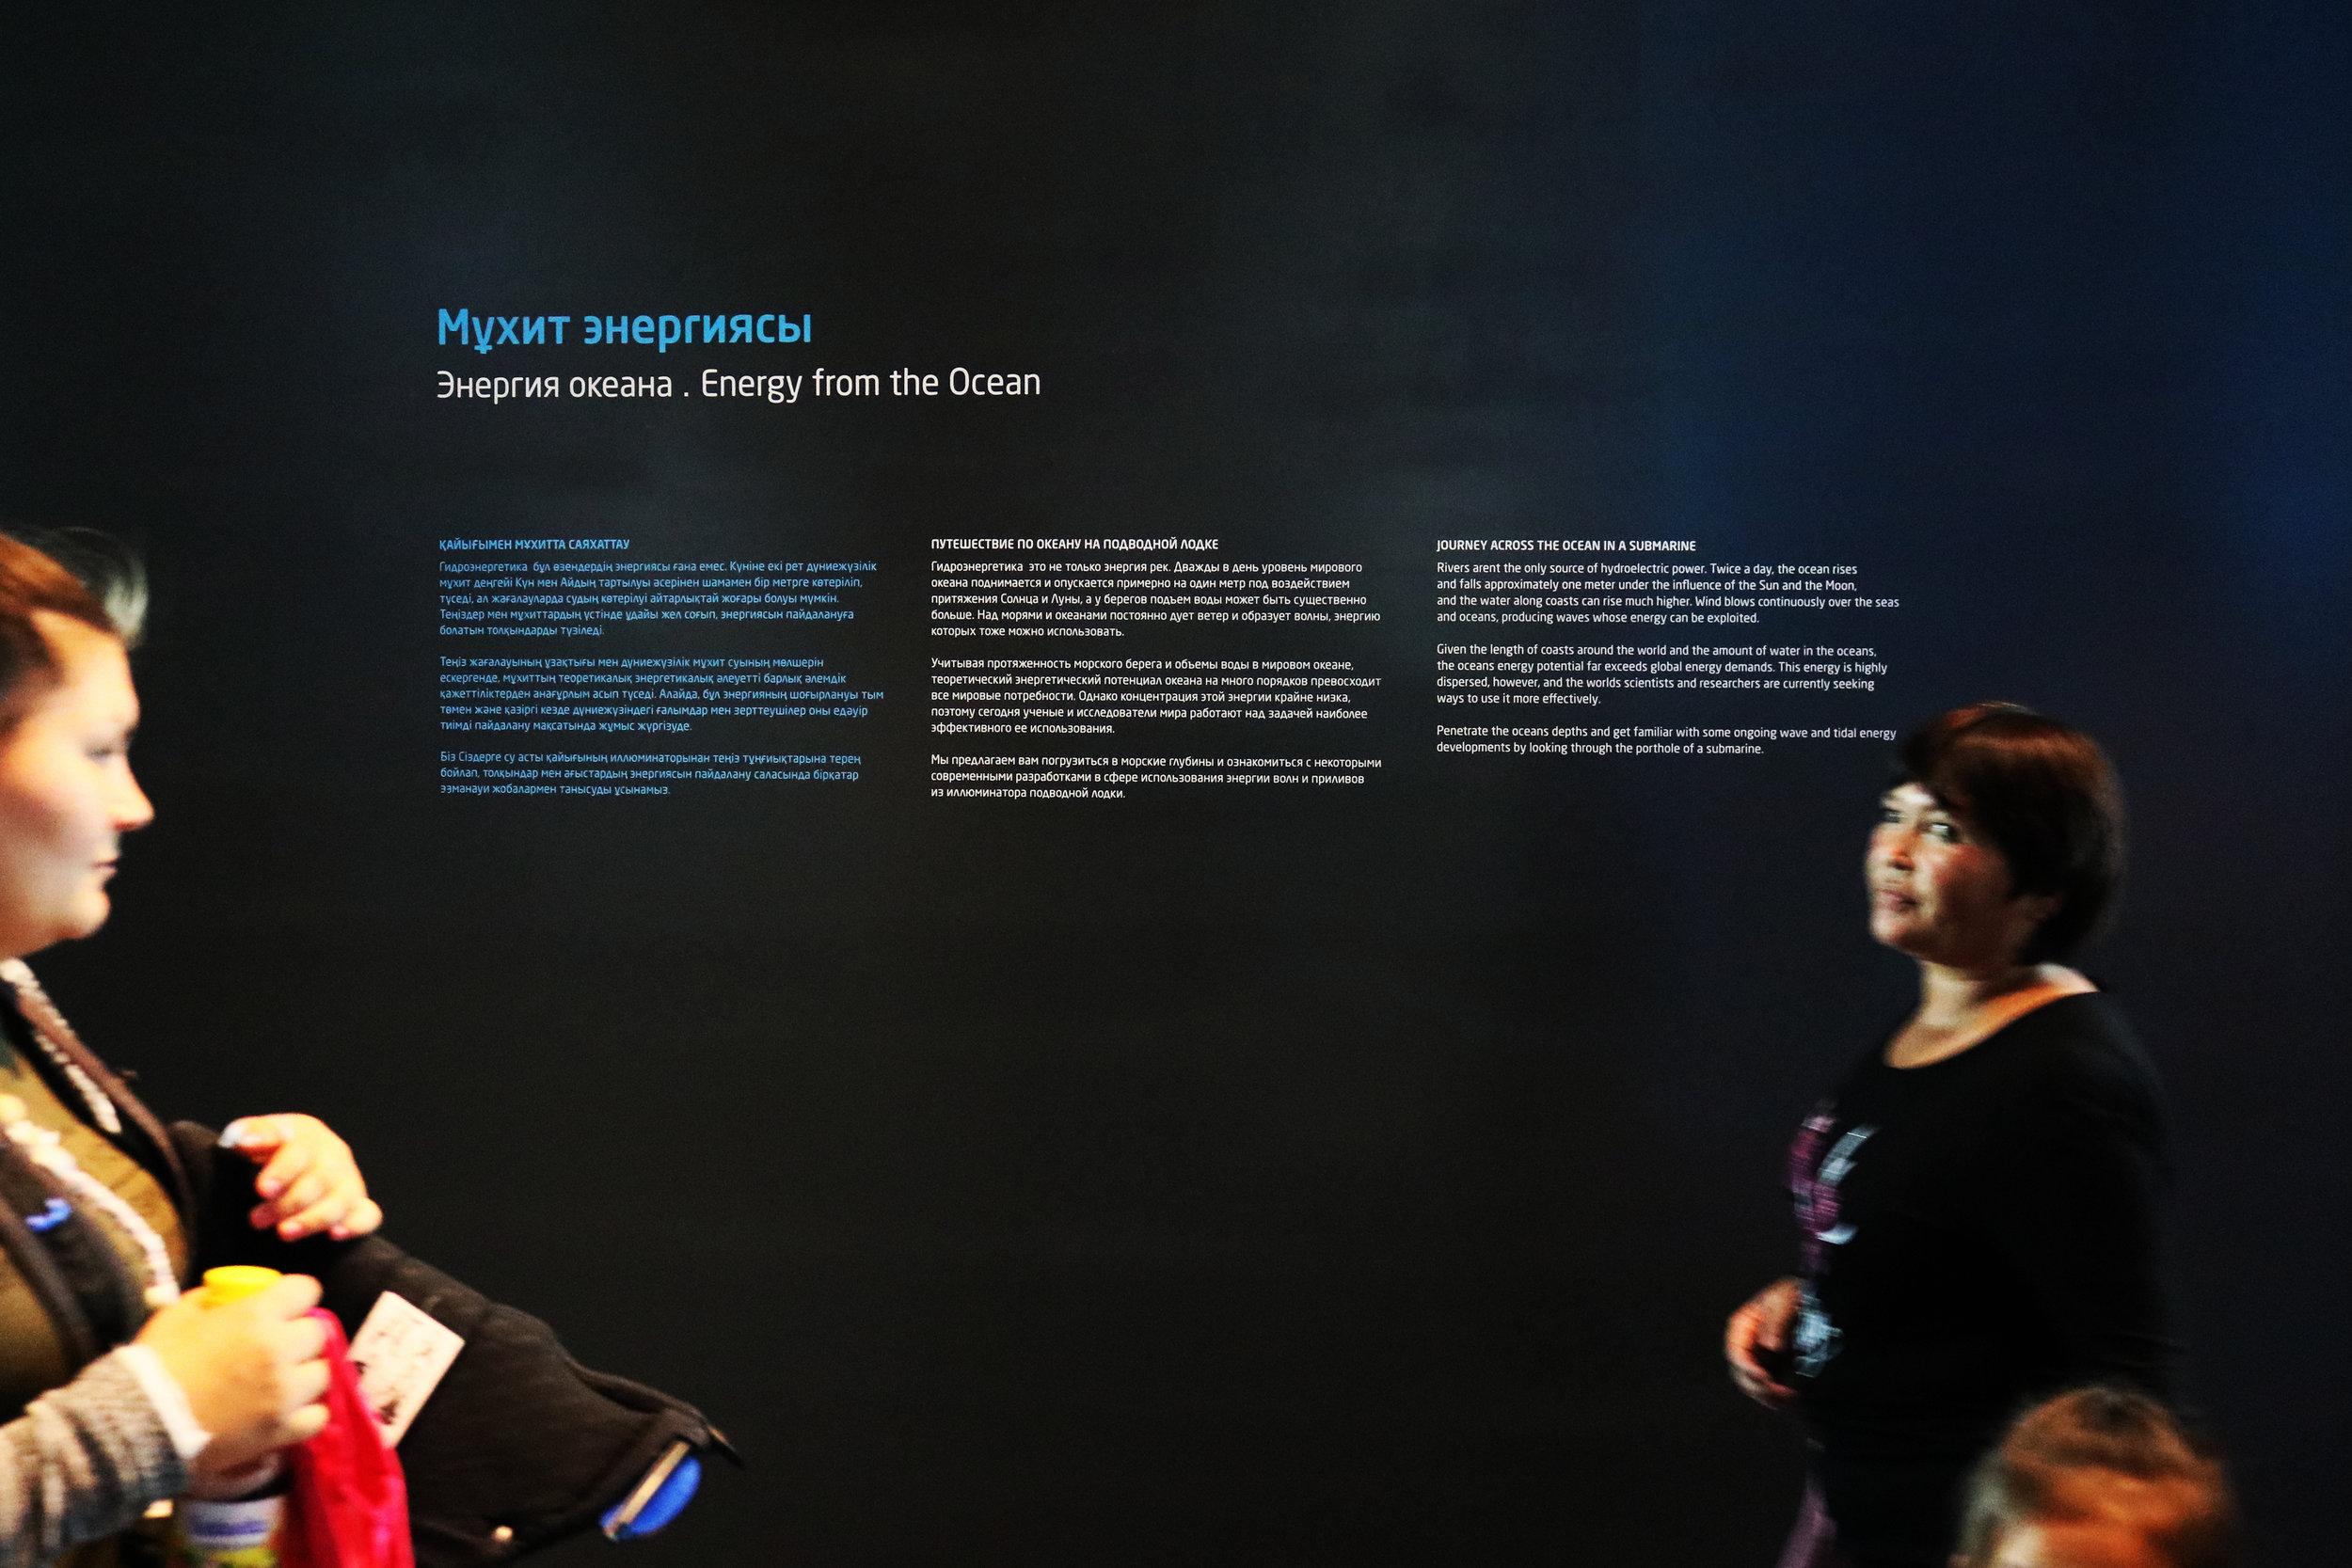 Astana_Sphere_Text.jpg